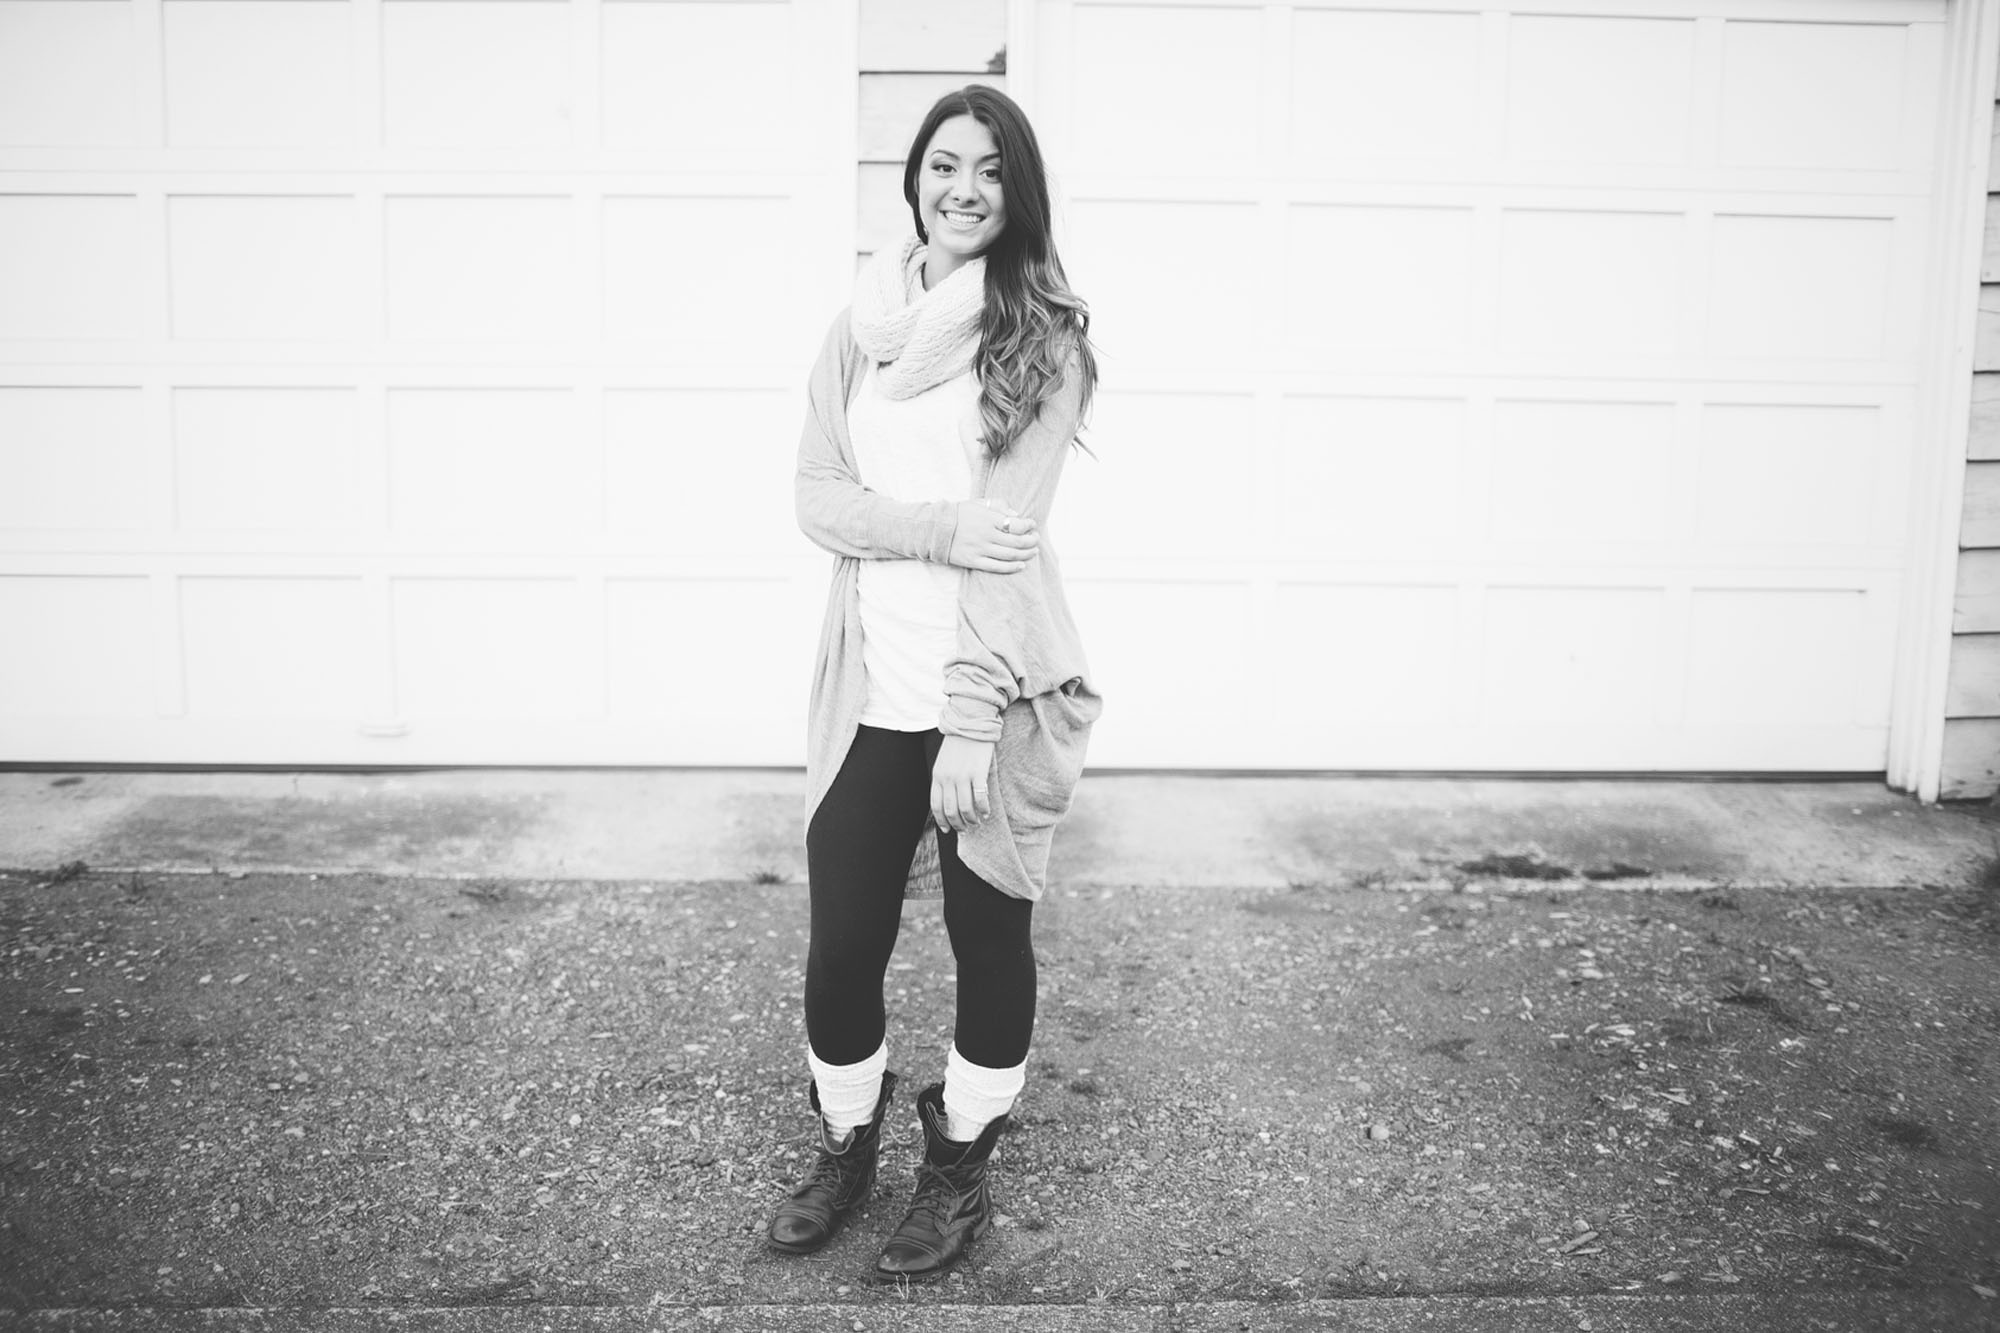 Seattle girl senior portrait - Mike Fiechtner Photography